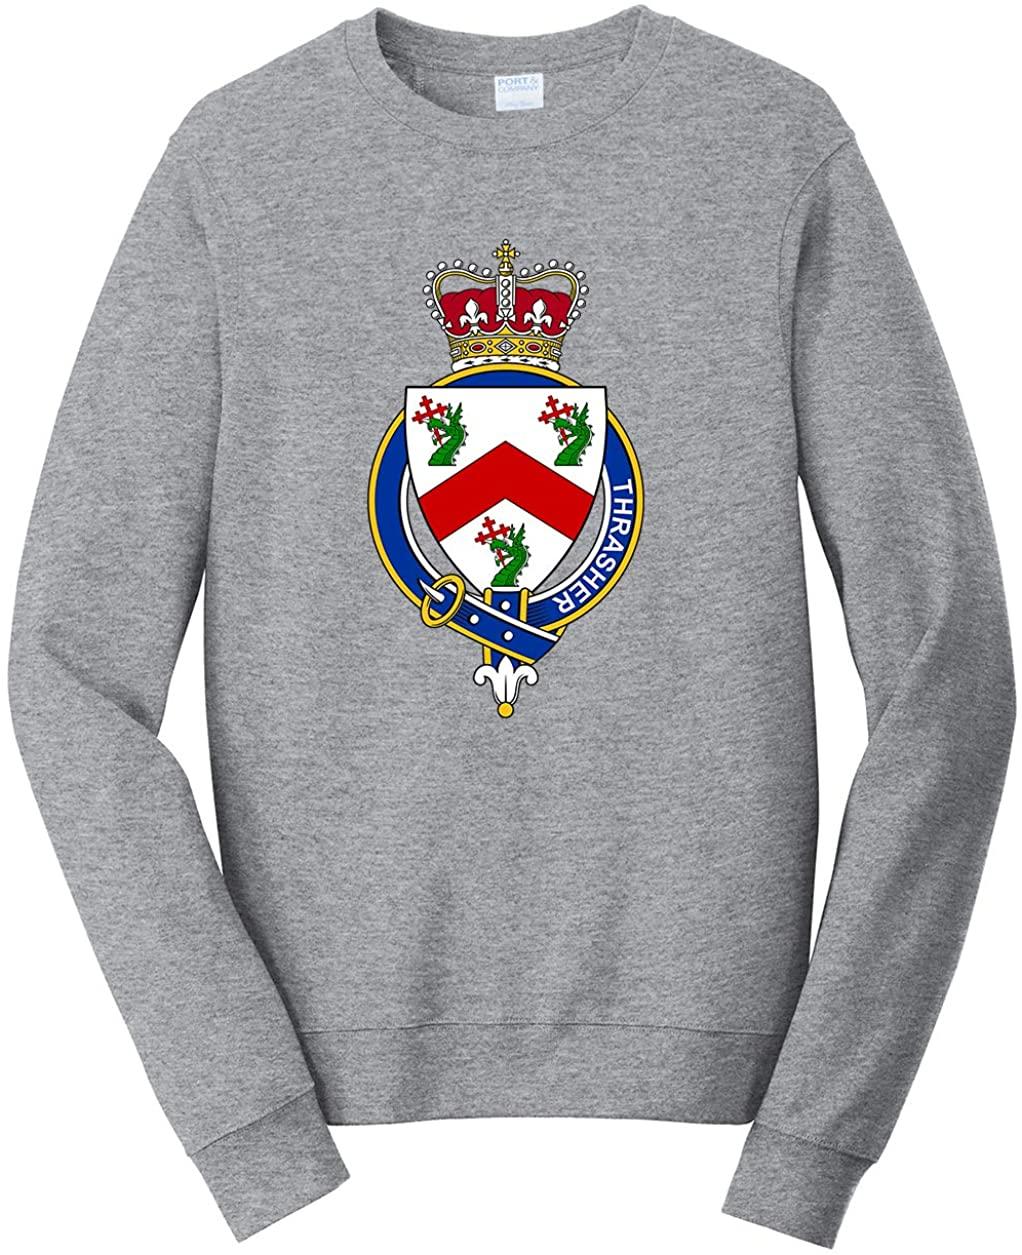 Tenacitee Unisex English Garter Family Trasher Sweatshirt